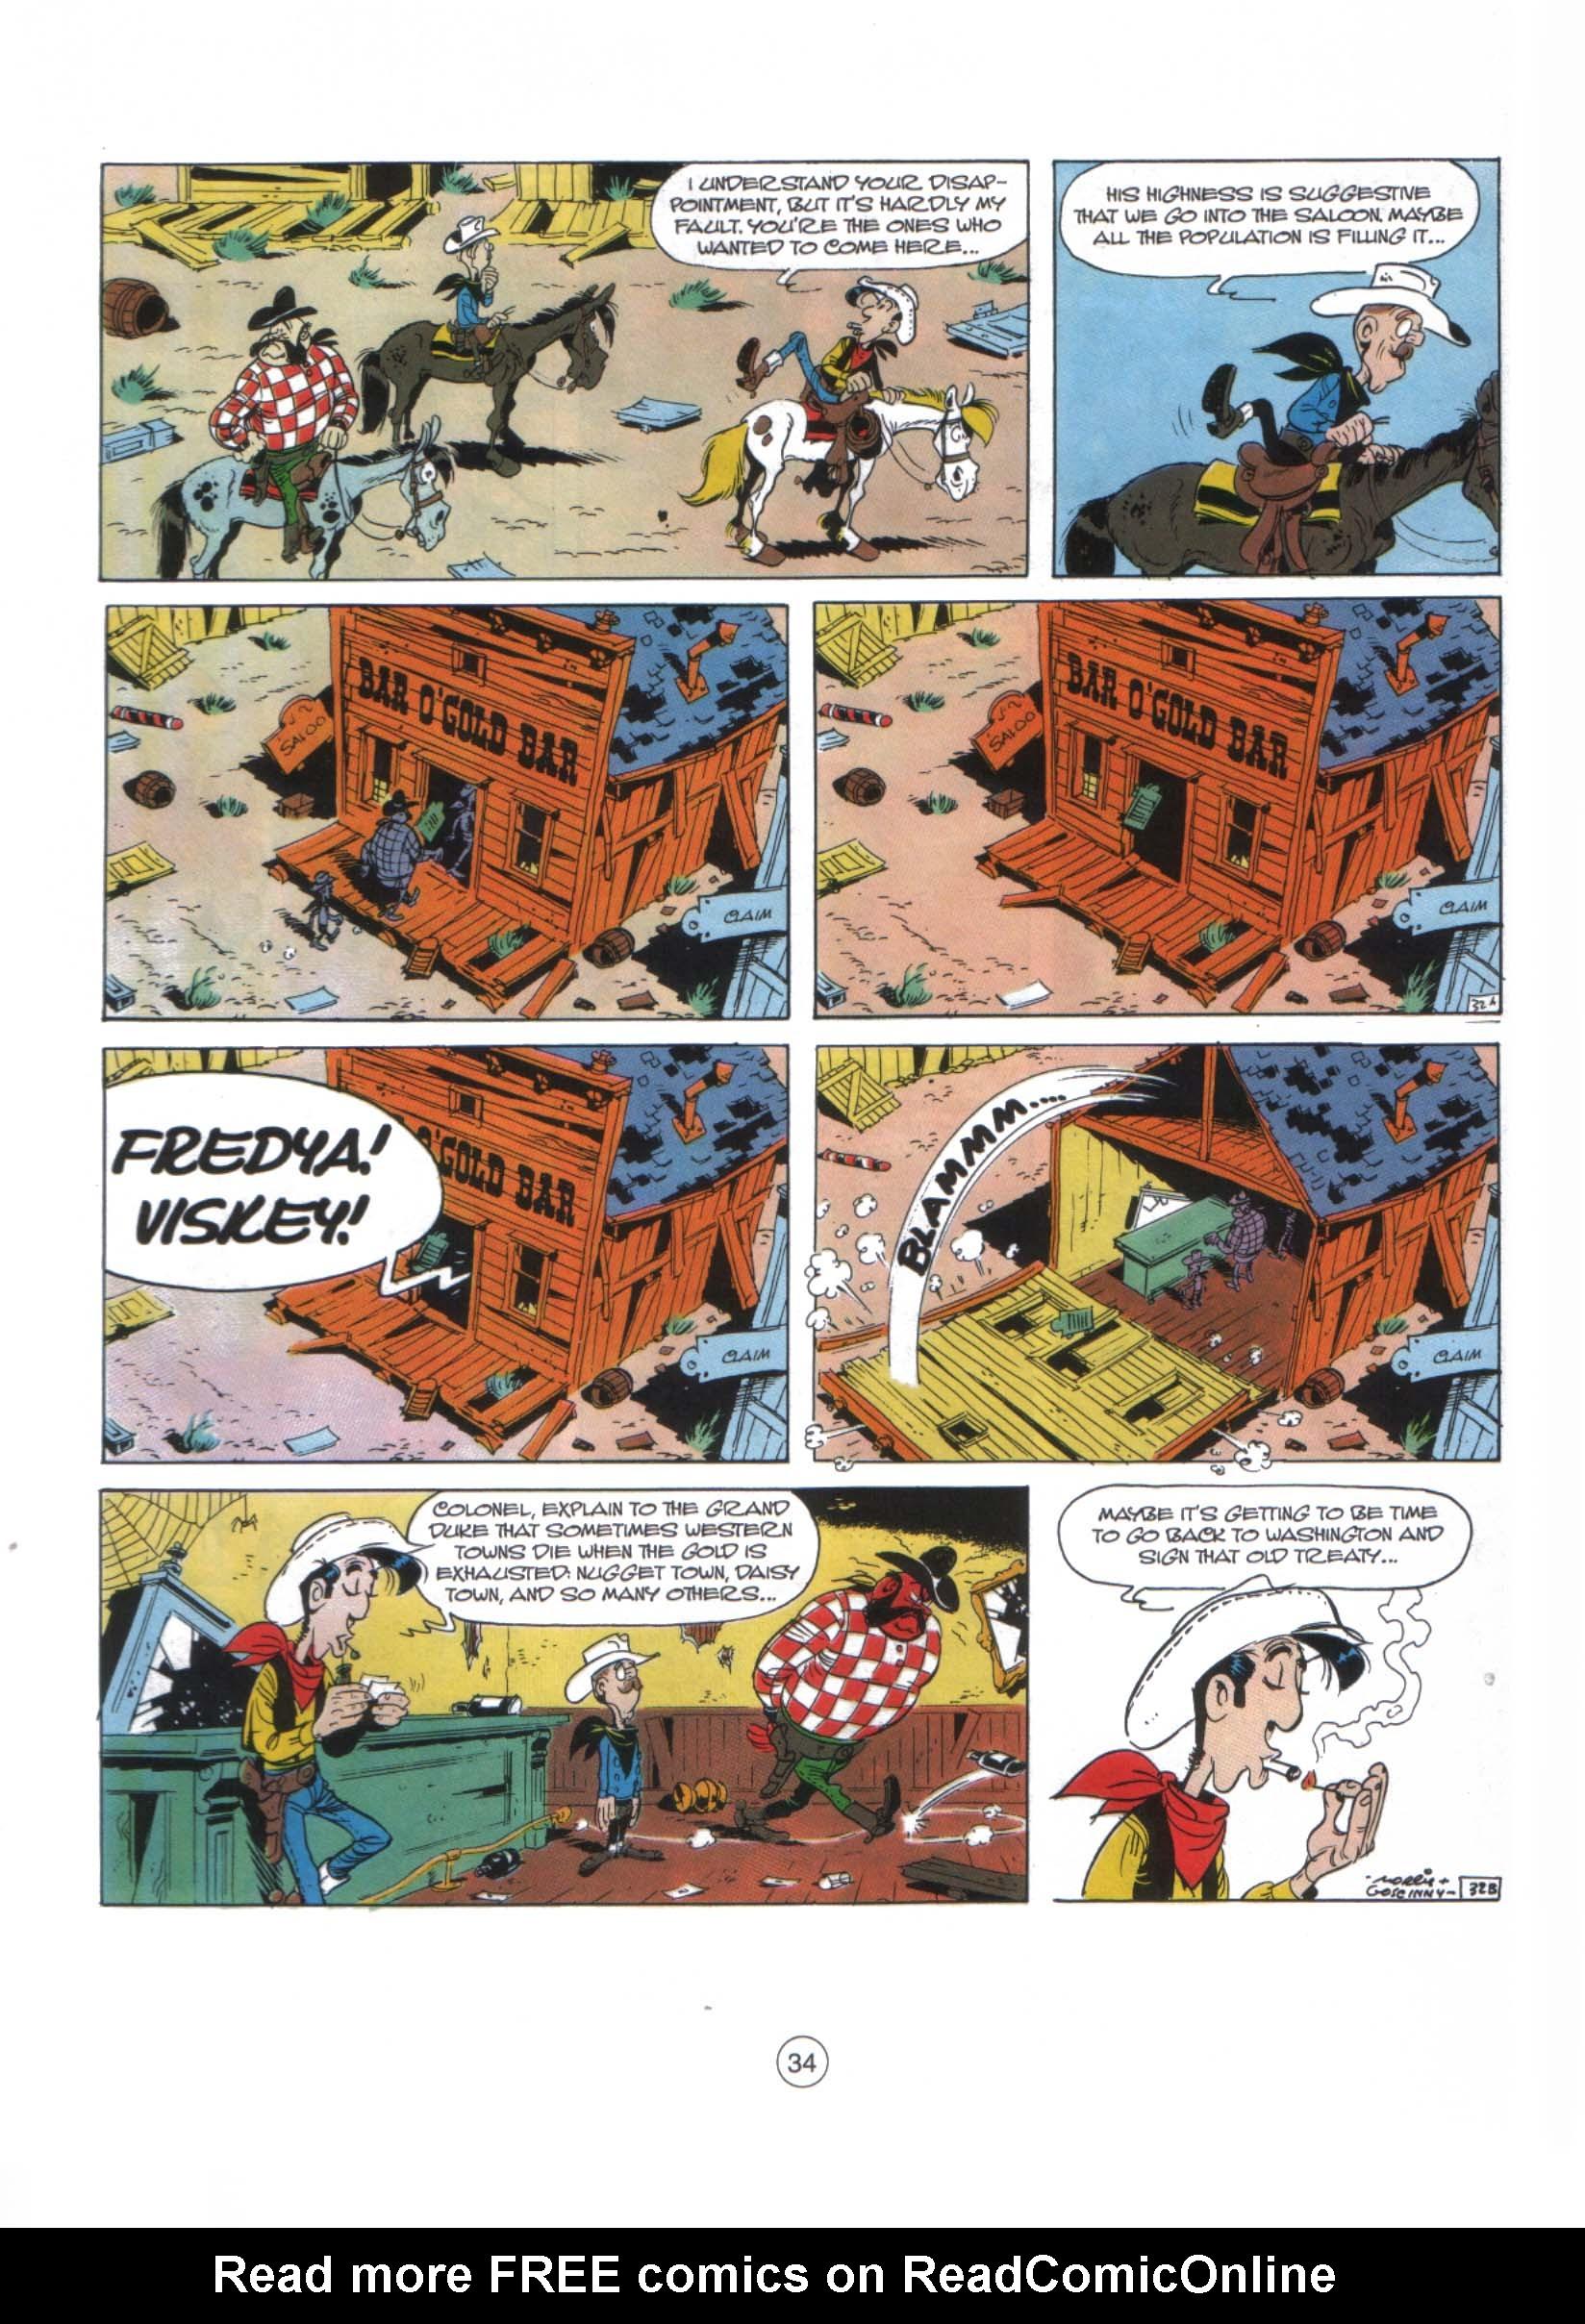 A Lucky Luke Adventure 29 Page 32